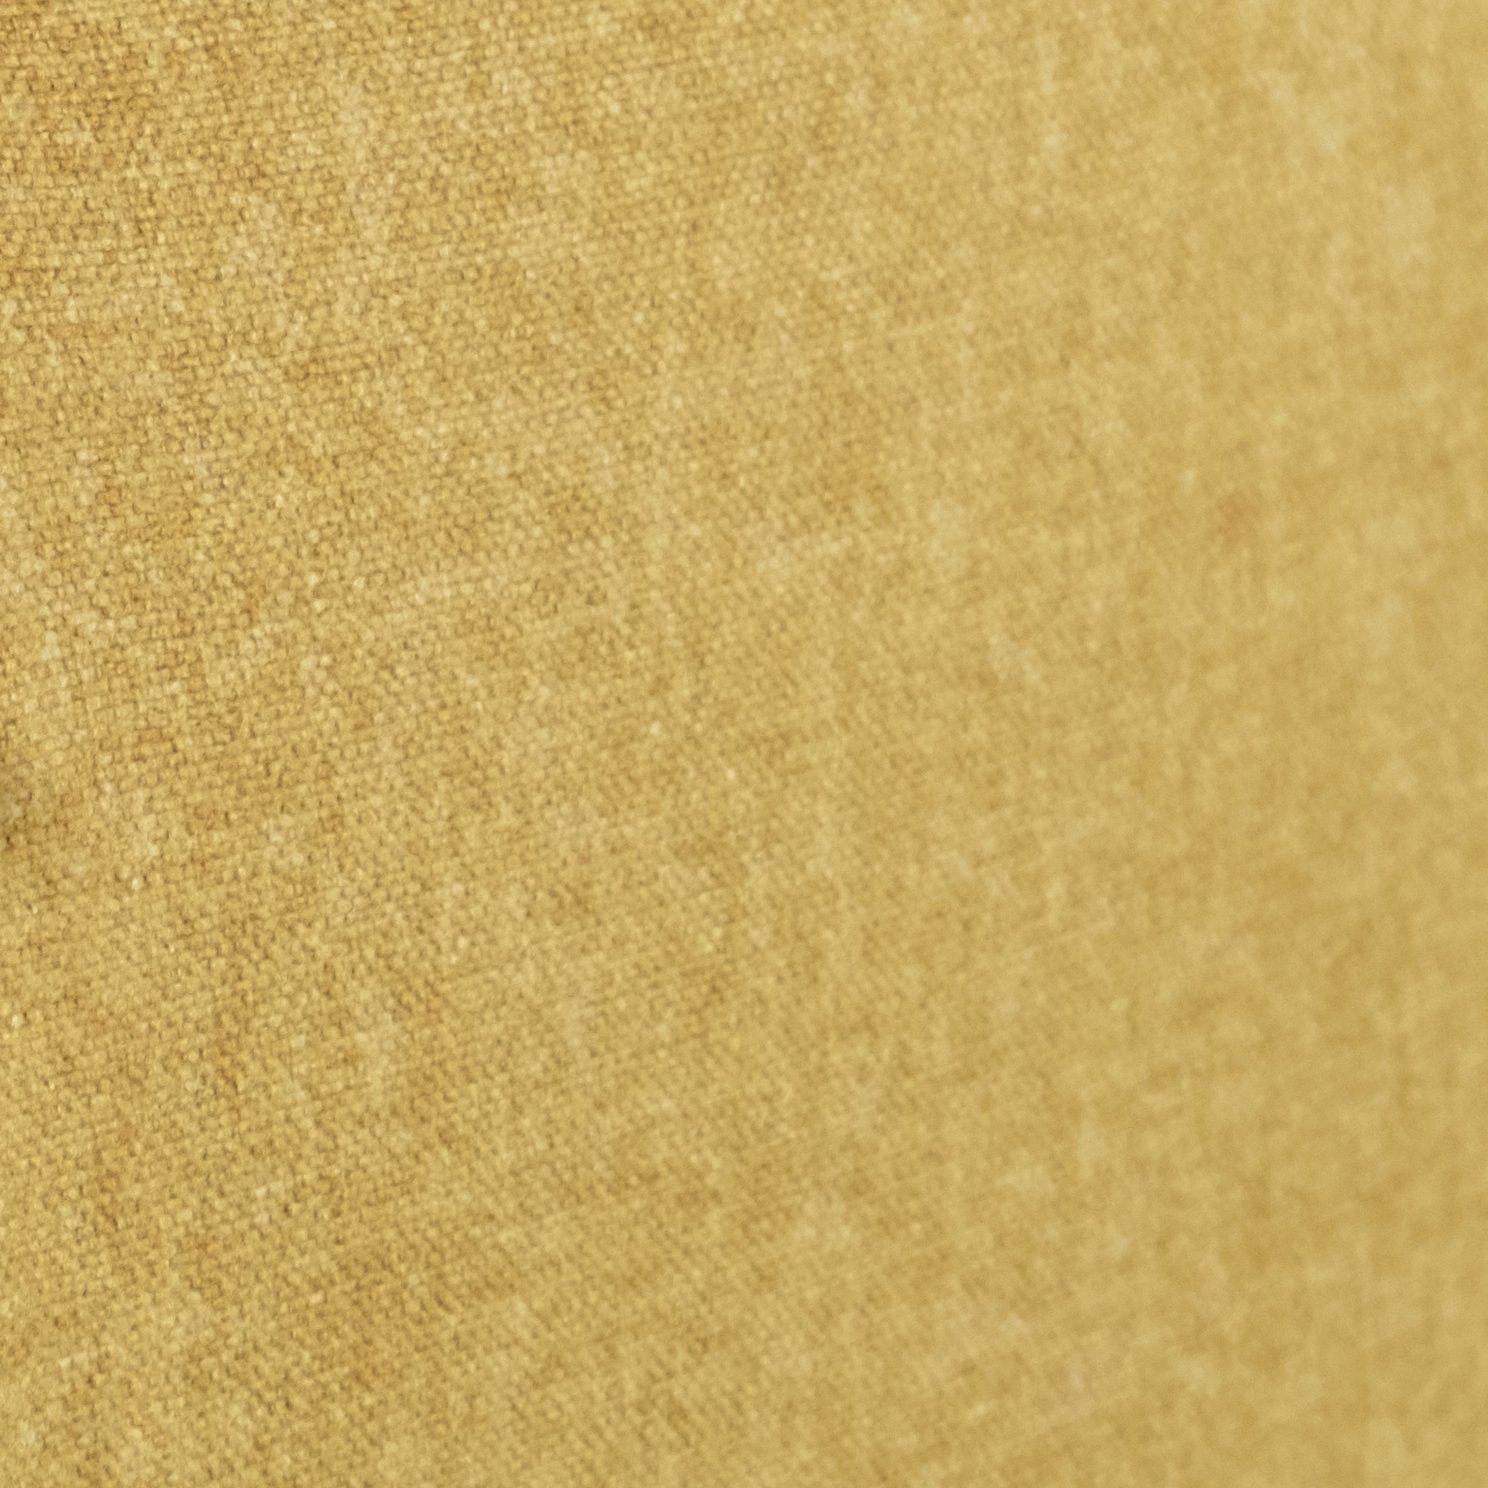 Decowood Cabecero Liso, Poliéster, Mostaza, Individual, 90x80x7,5 cm: Amazon.es: Hogar